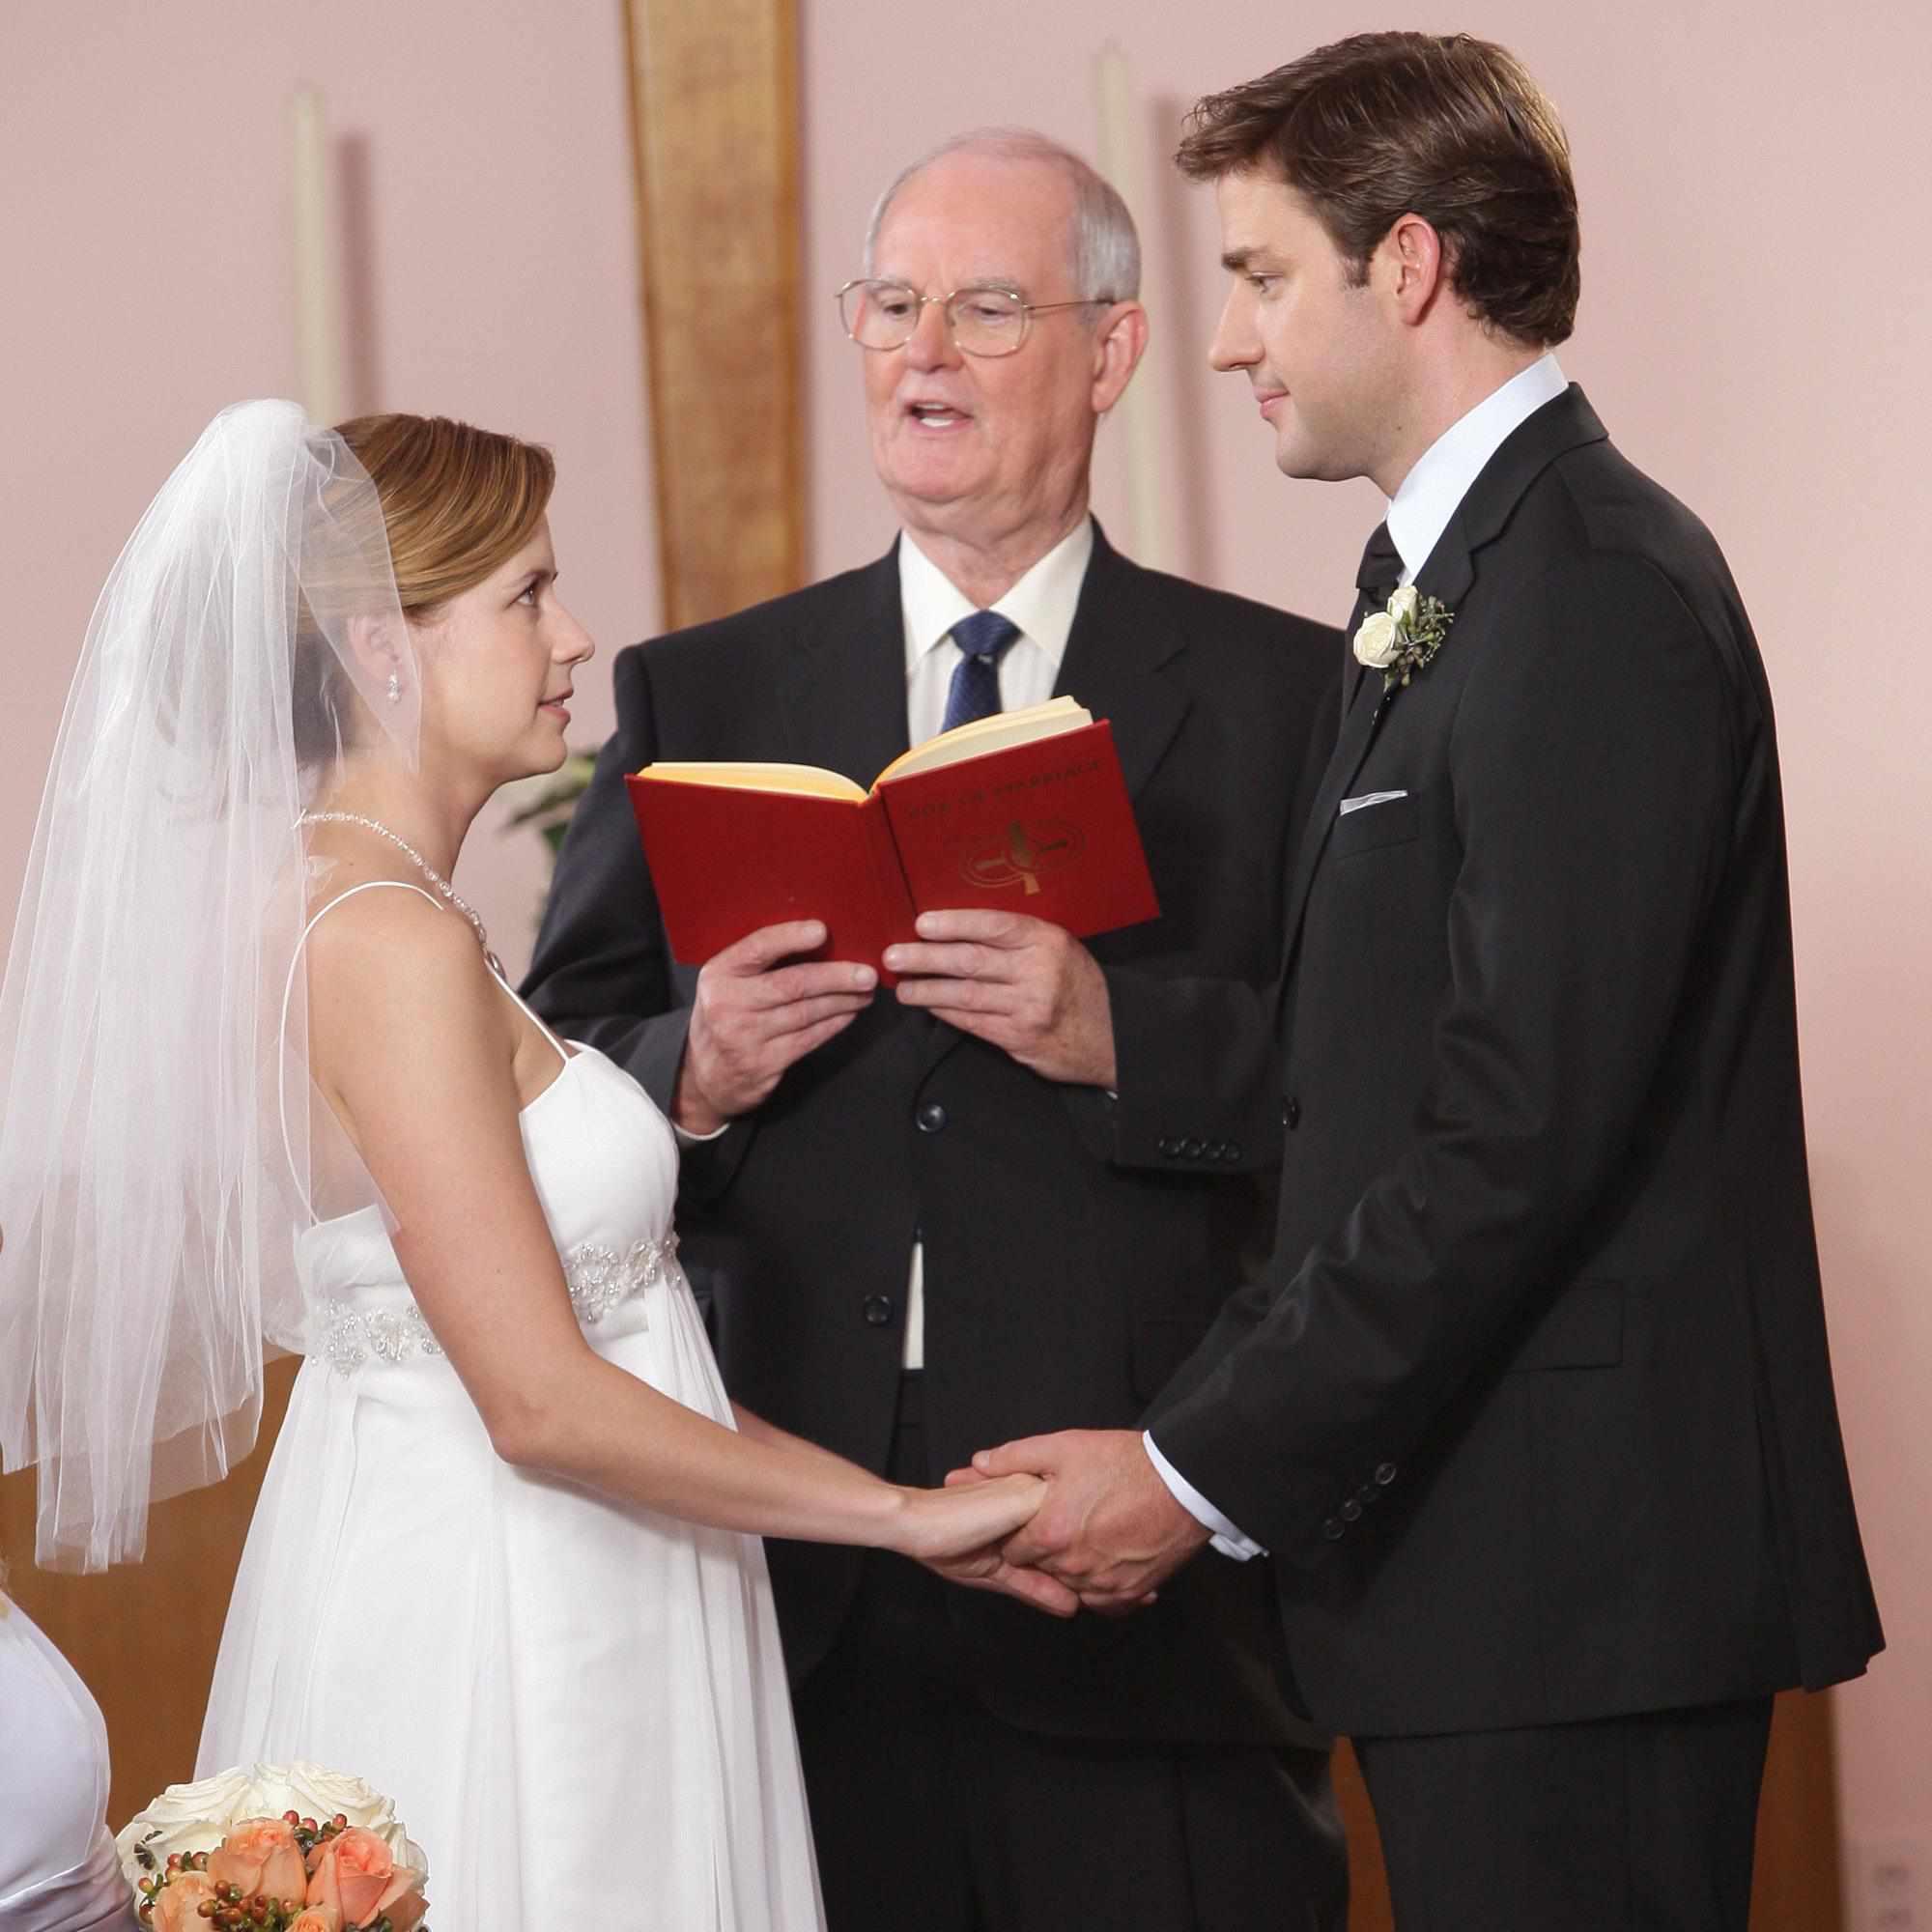 pam and jim's wedding